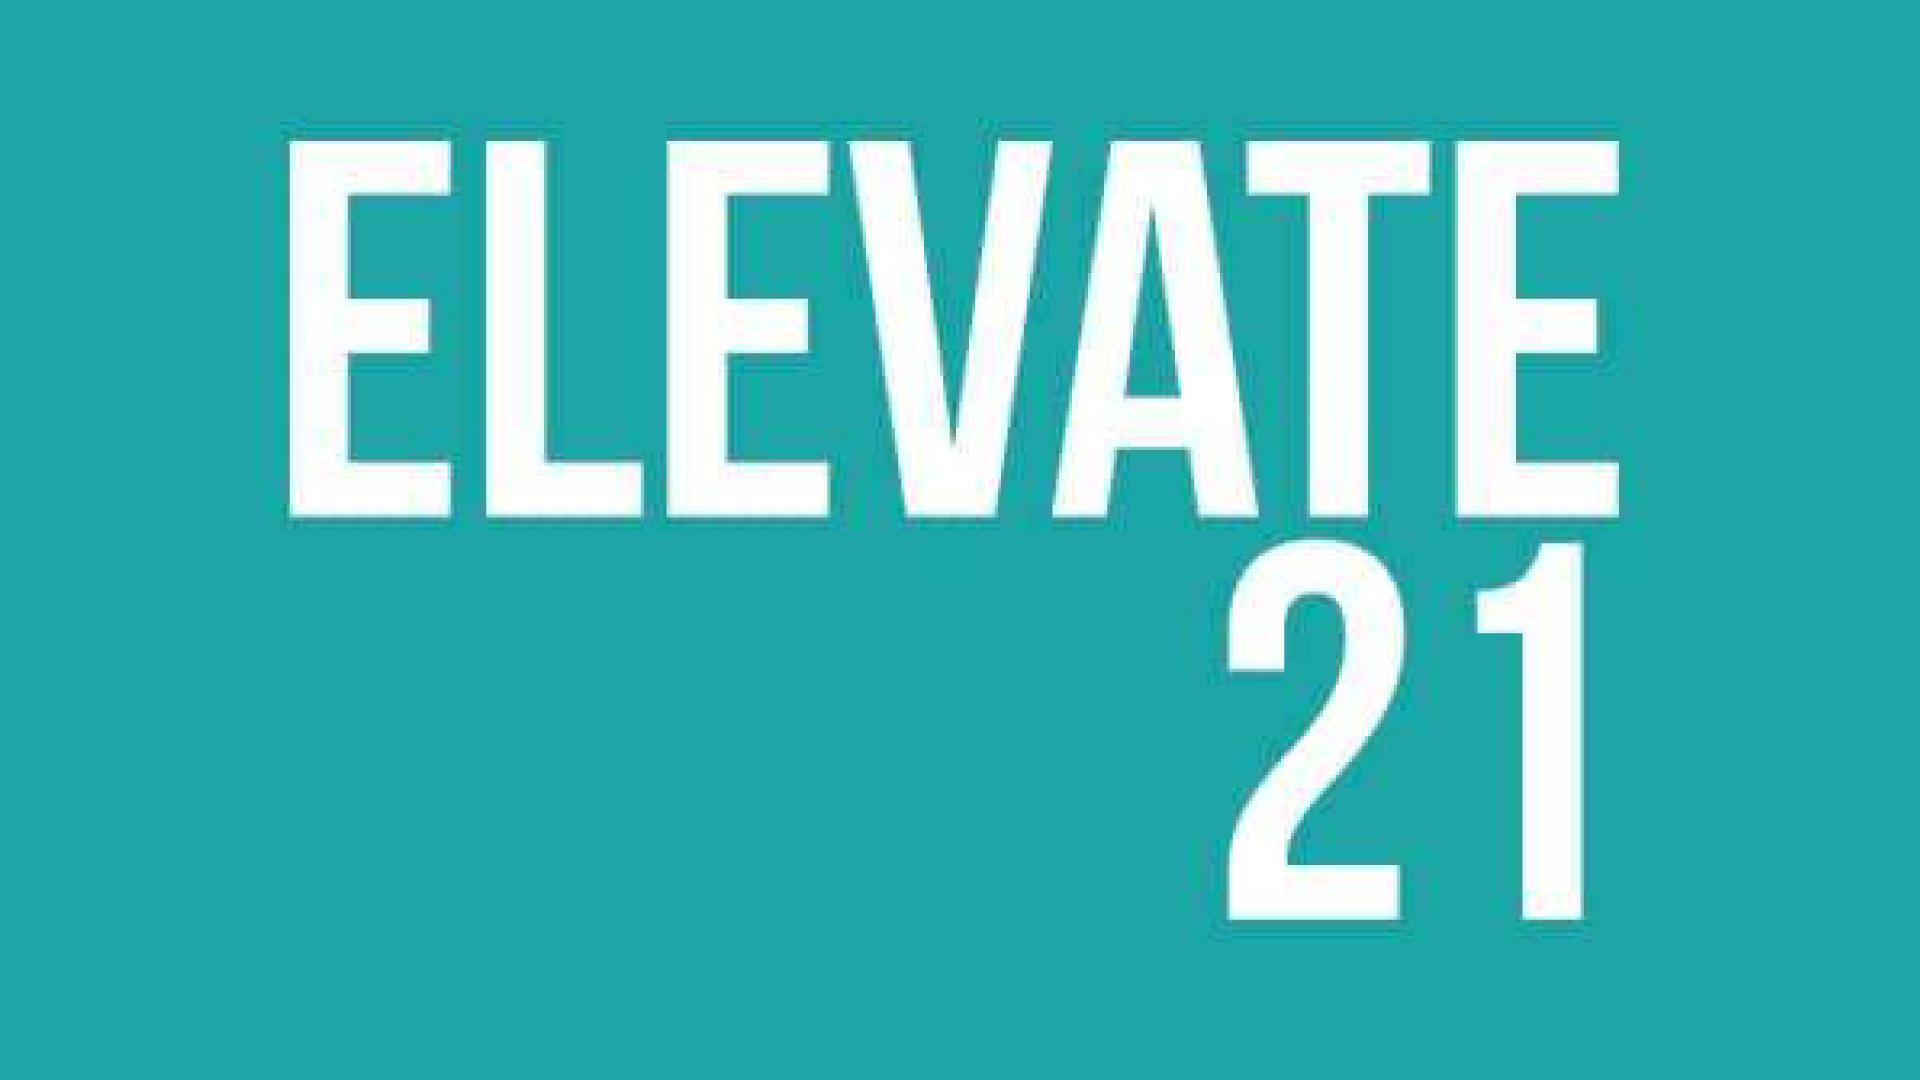 ELEVATE2021